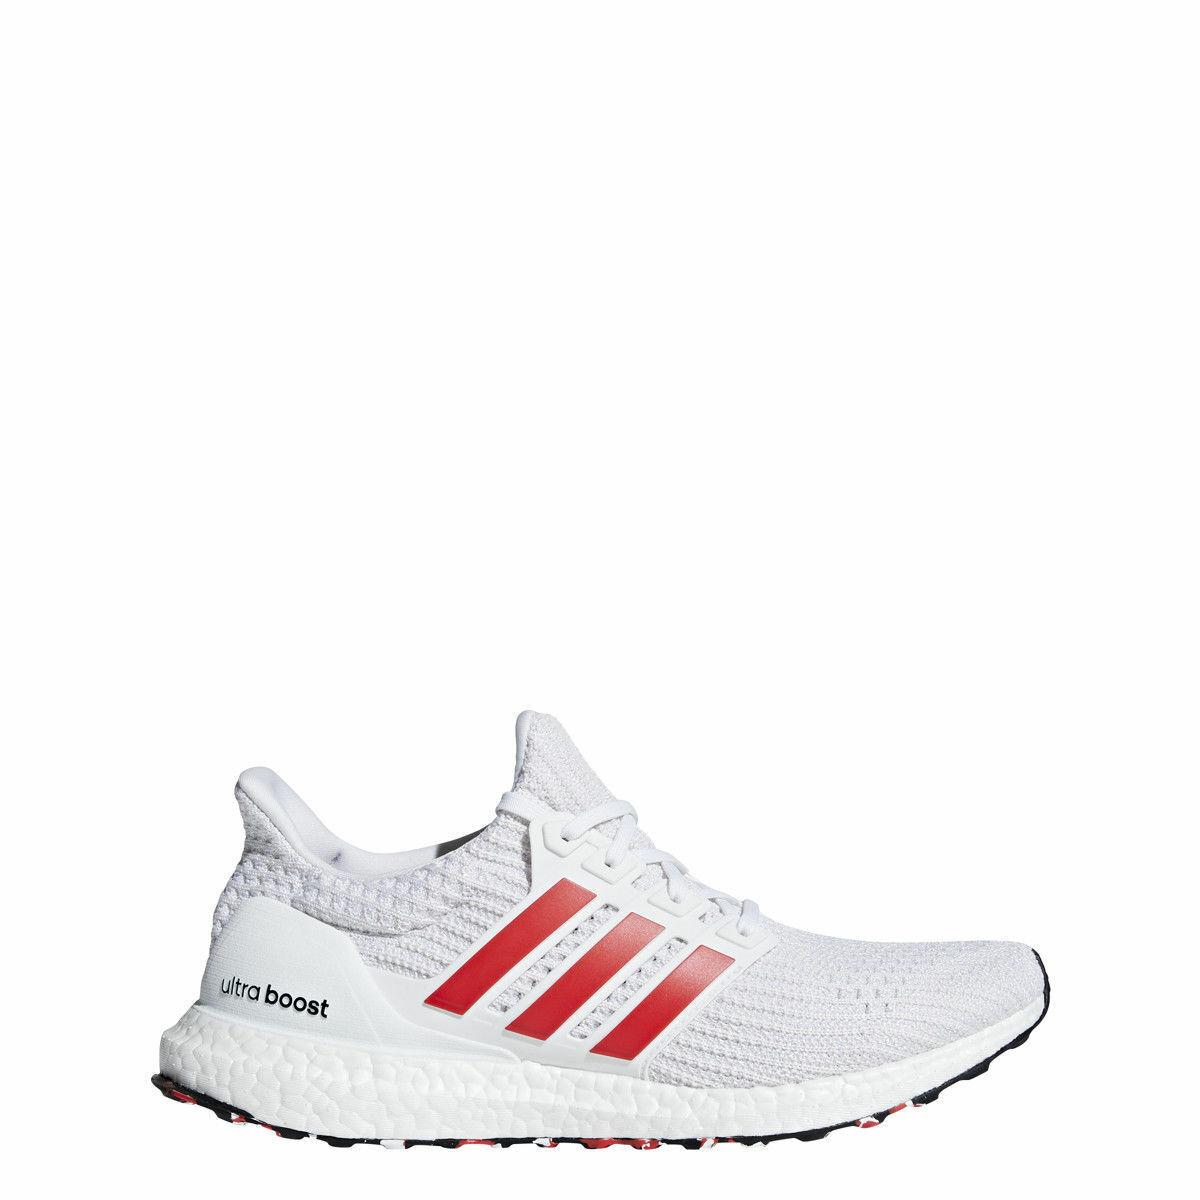 Adidas Herren Ultra Boost - Neu in Karton Weiß Rot - DB3199